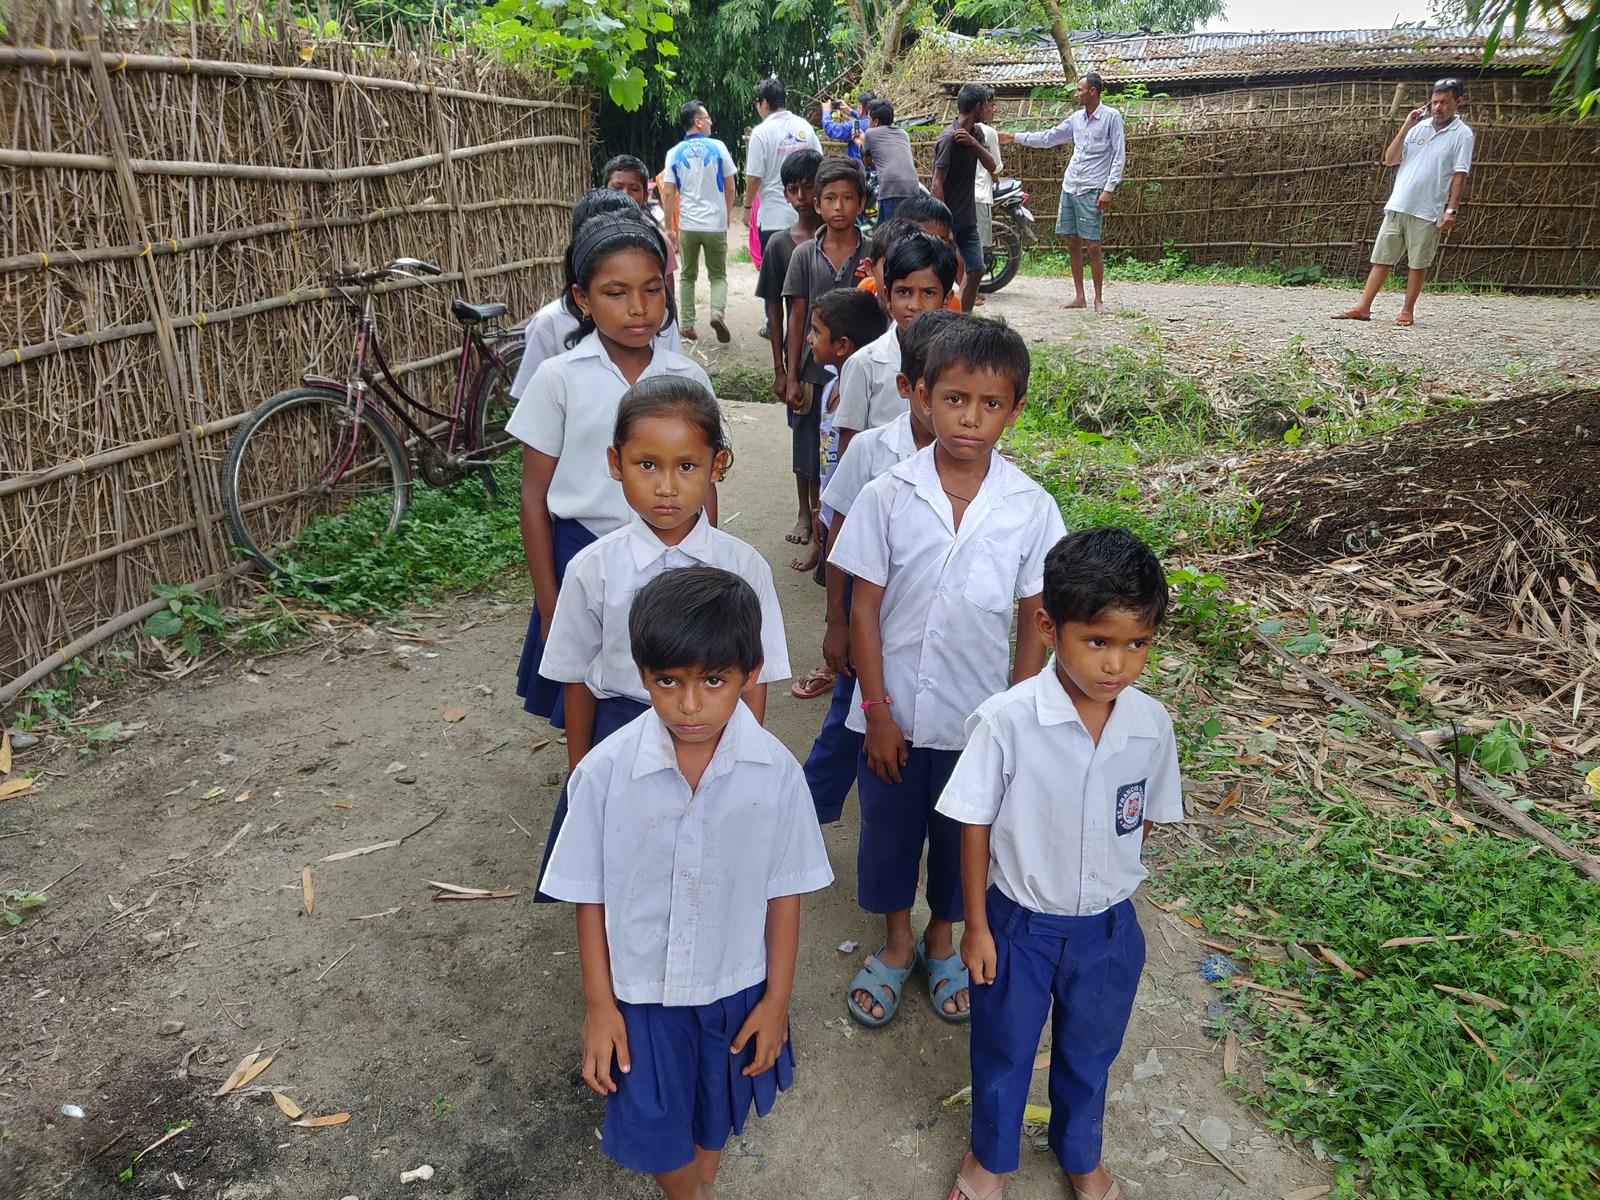 Free-Health-Camp-Eye-Screening-at-Gwala-Basti-Mechinagar-15-Jhapa-Nepal-Rotary-Club-of-Kakarvitta-21